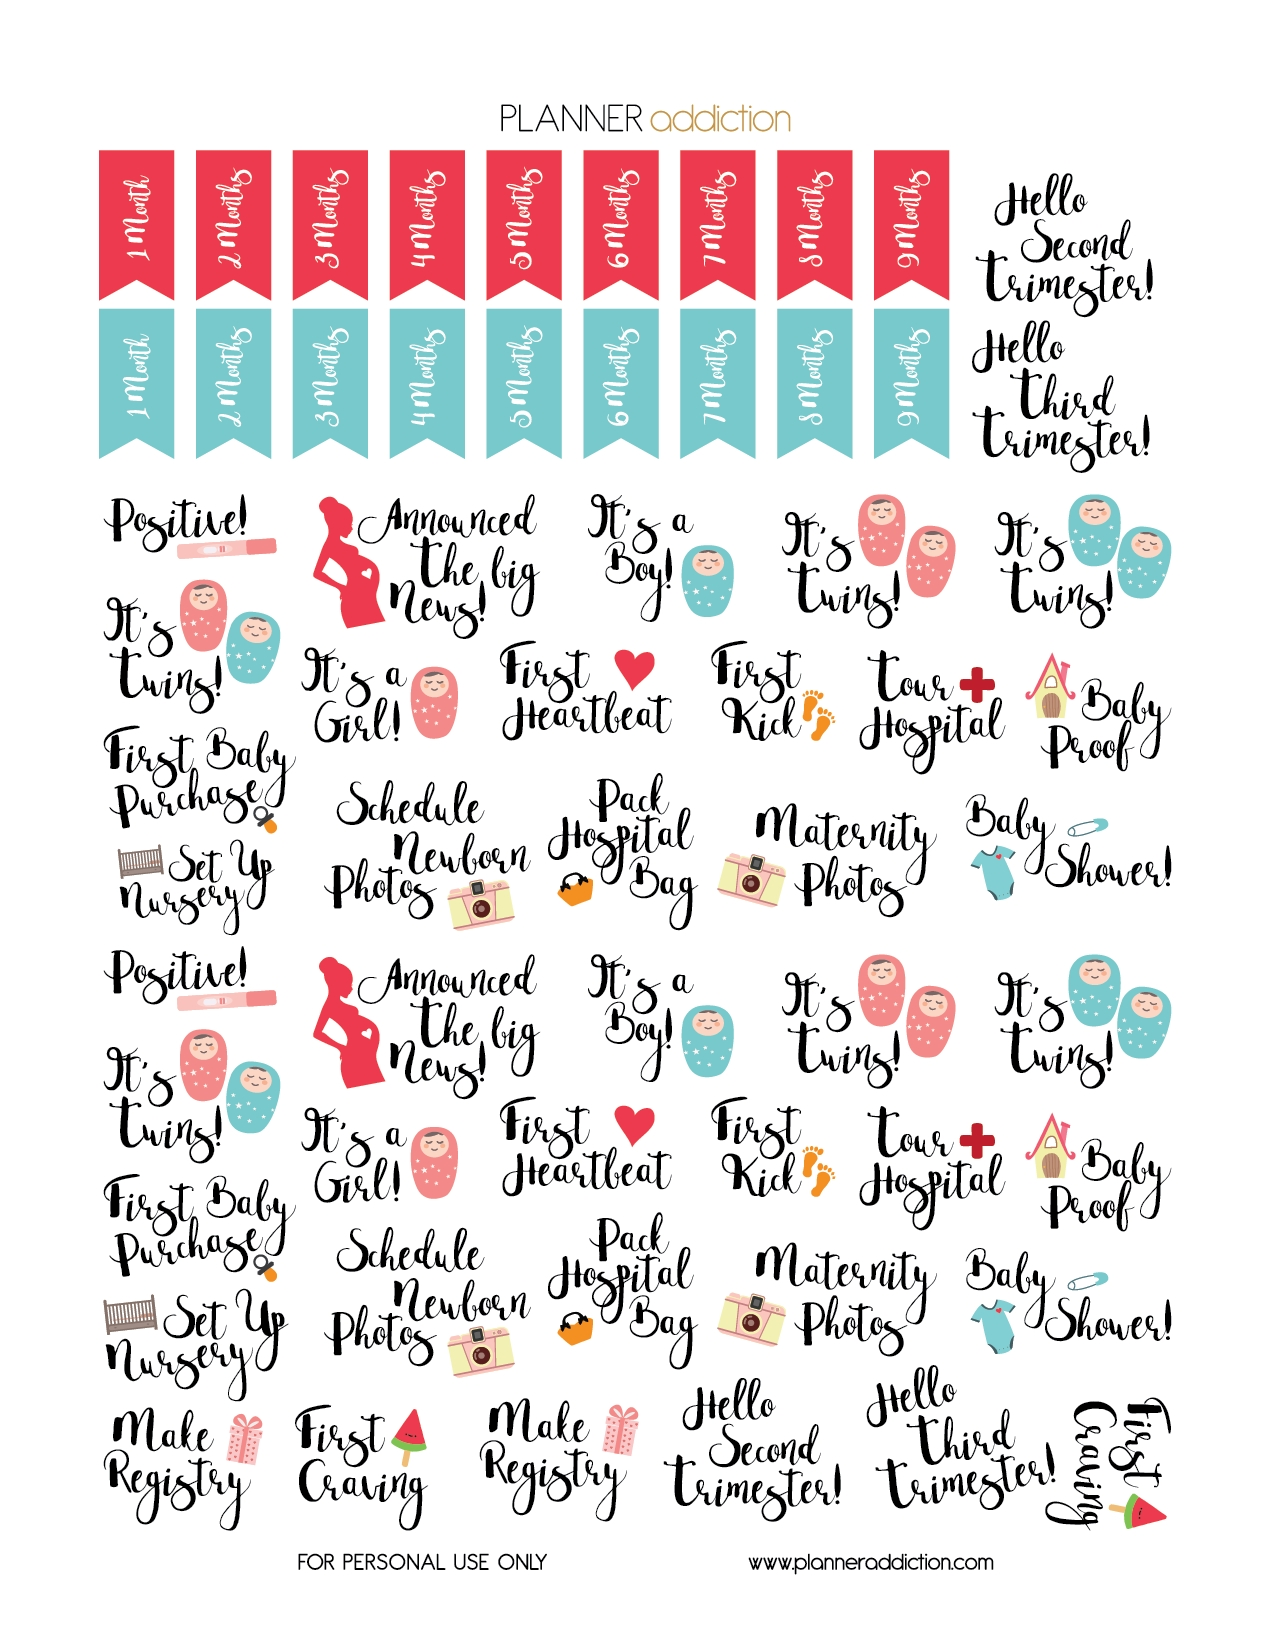 Free Printable Planner Stickers Pregnancy Planner Addiction